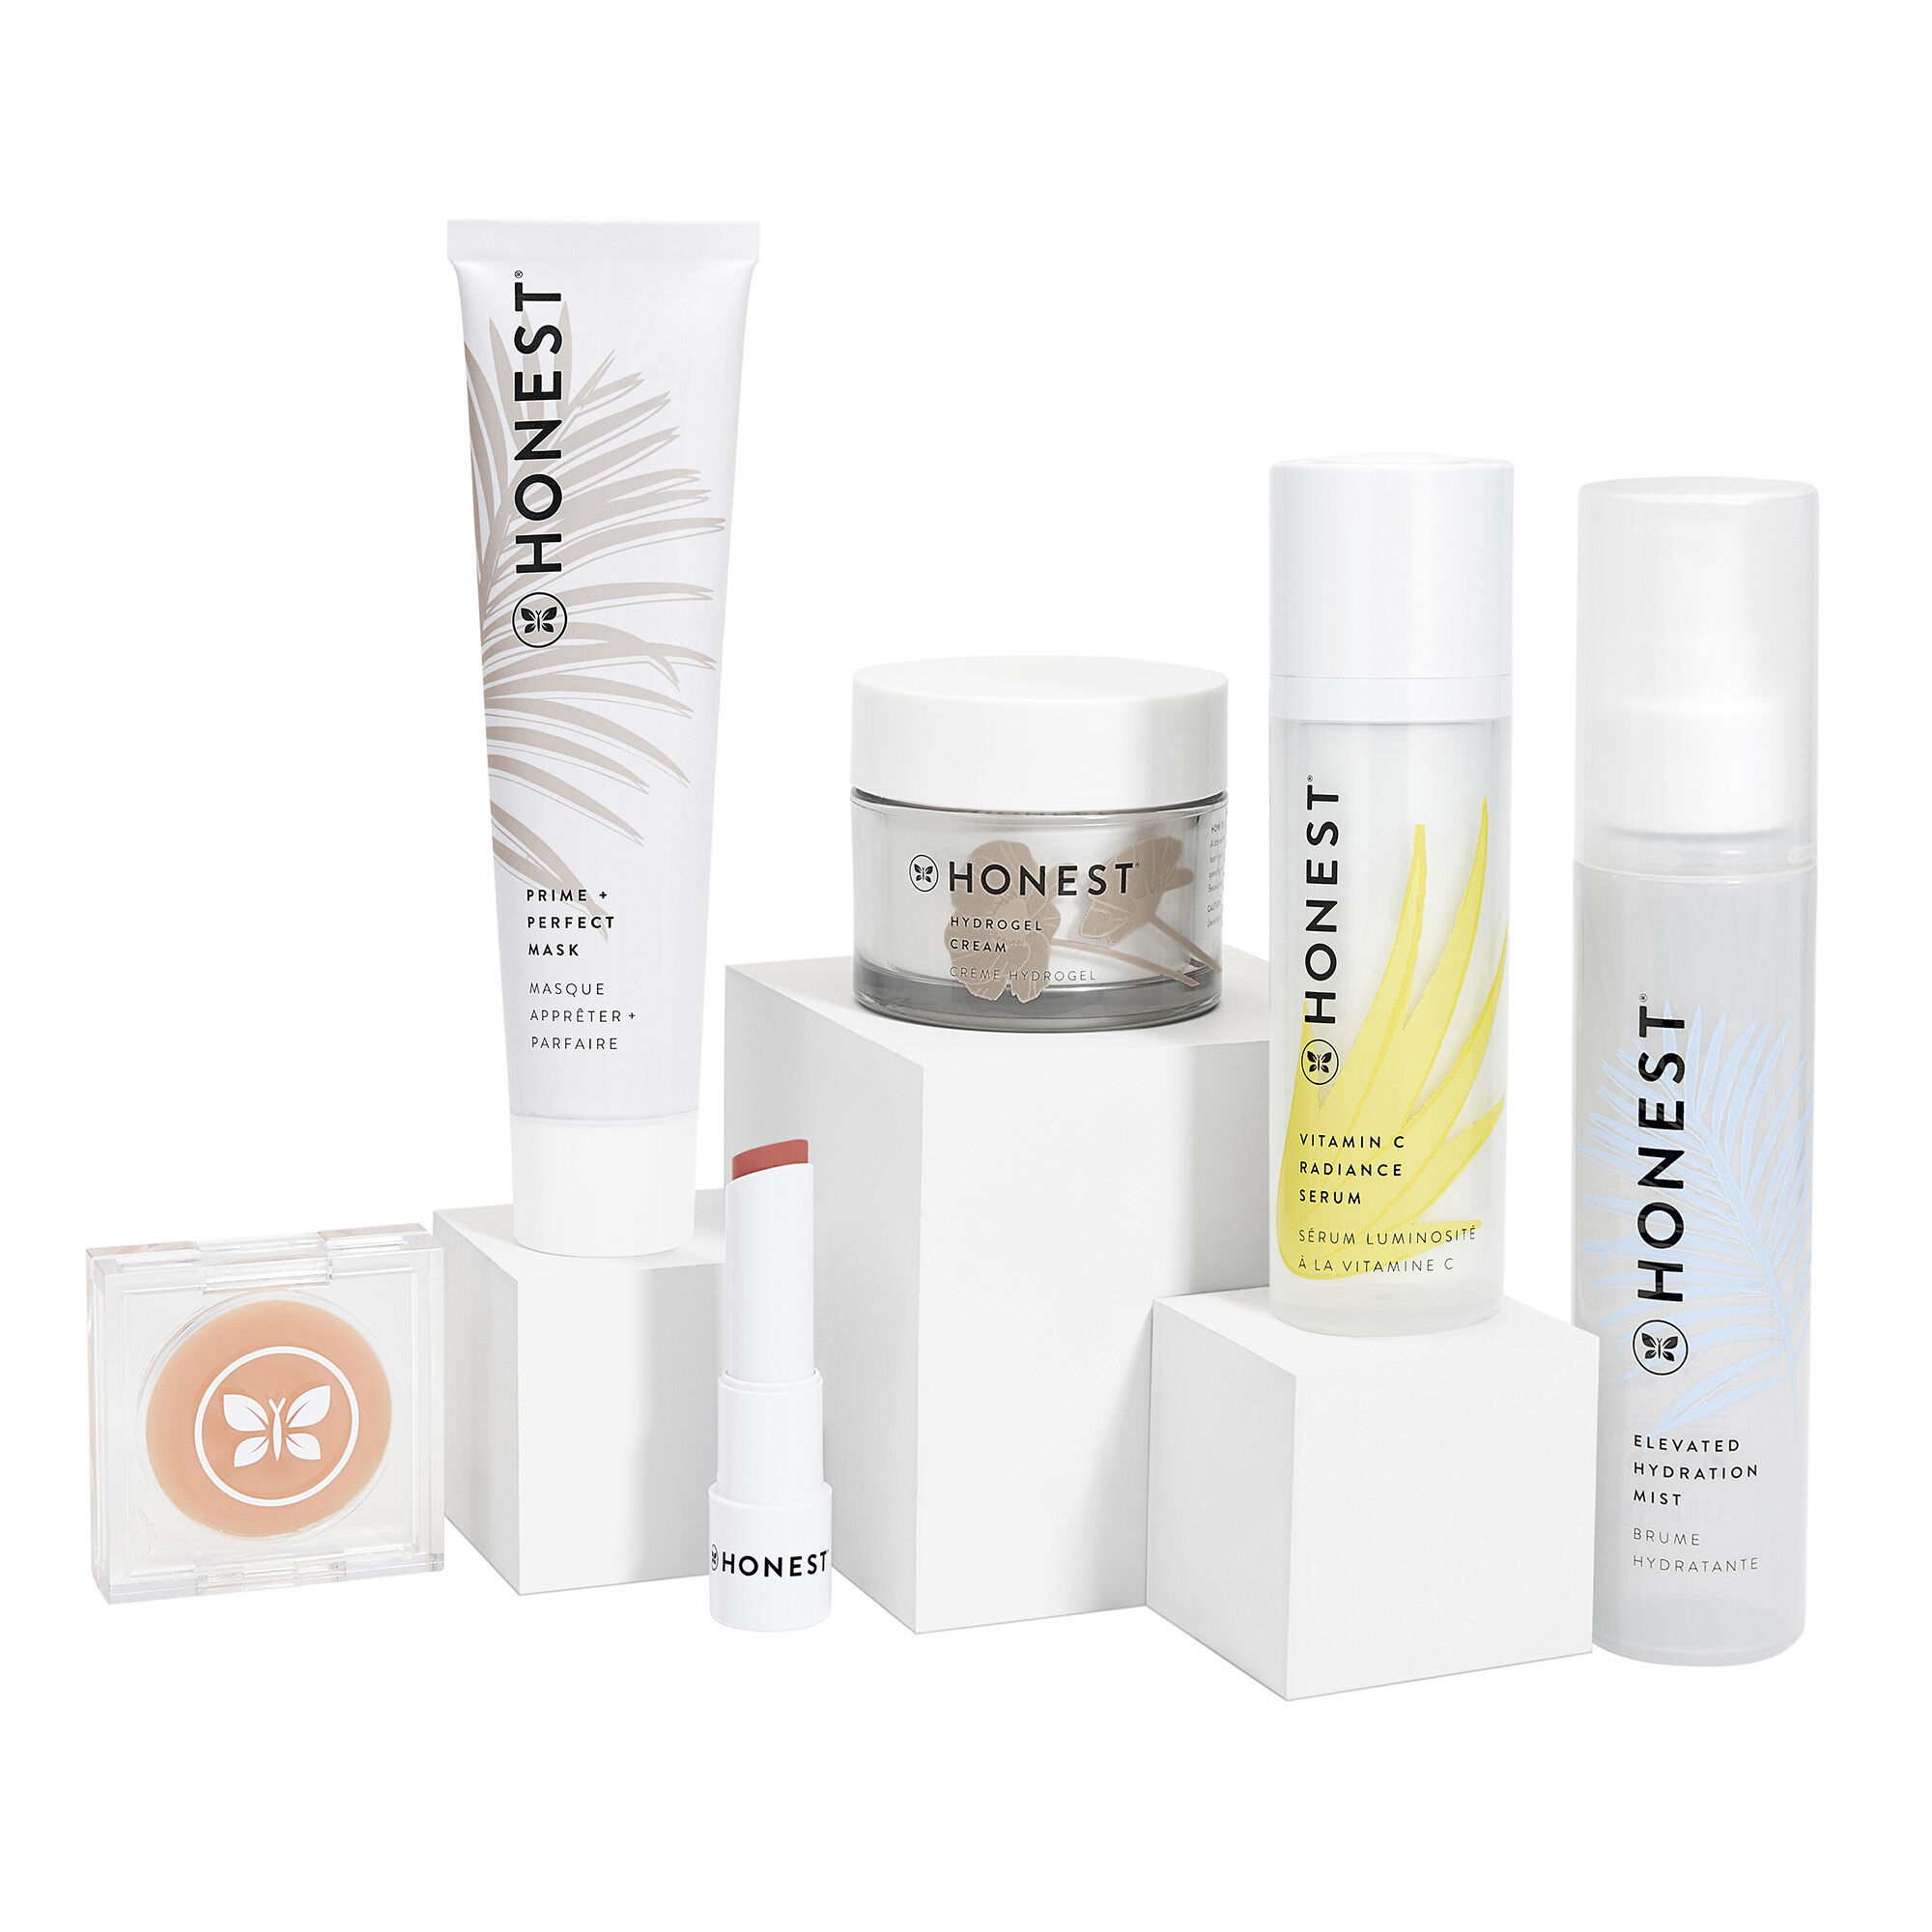 Jessica's Daily Skincare Routine